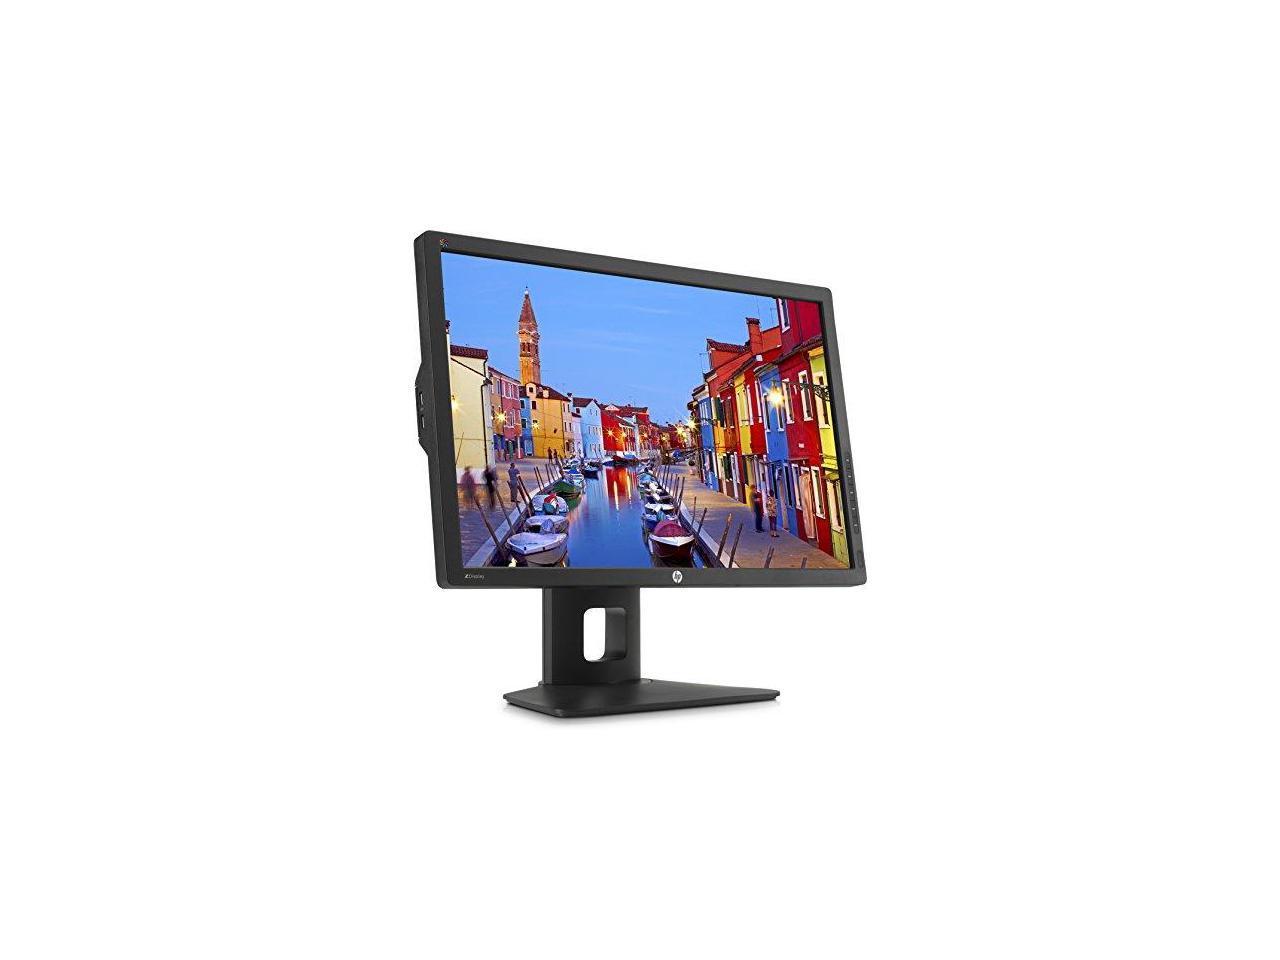 "HP DreamColor Z24x 24/"" 1920 x 1200 HDMI DVI DP LCD Monitor Display E9Q82AT#ABU"